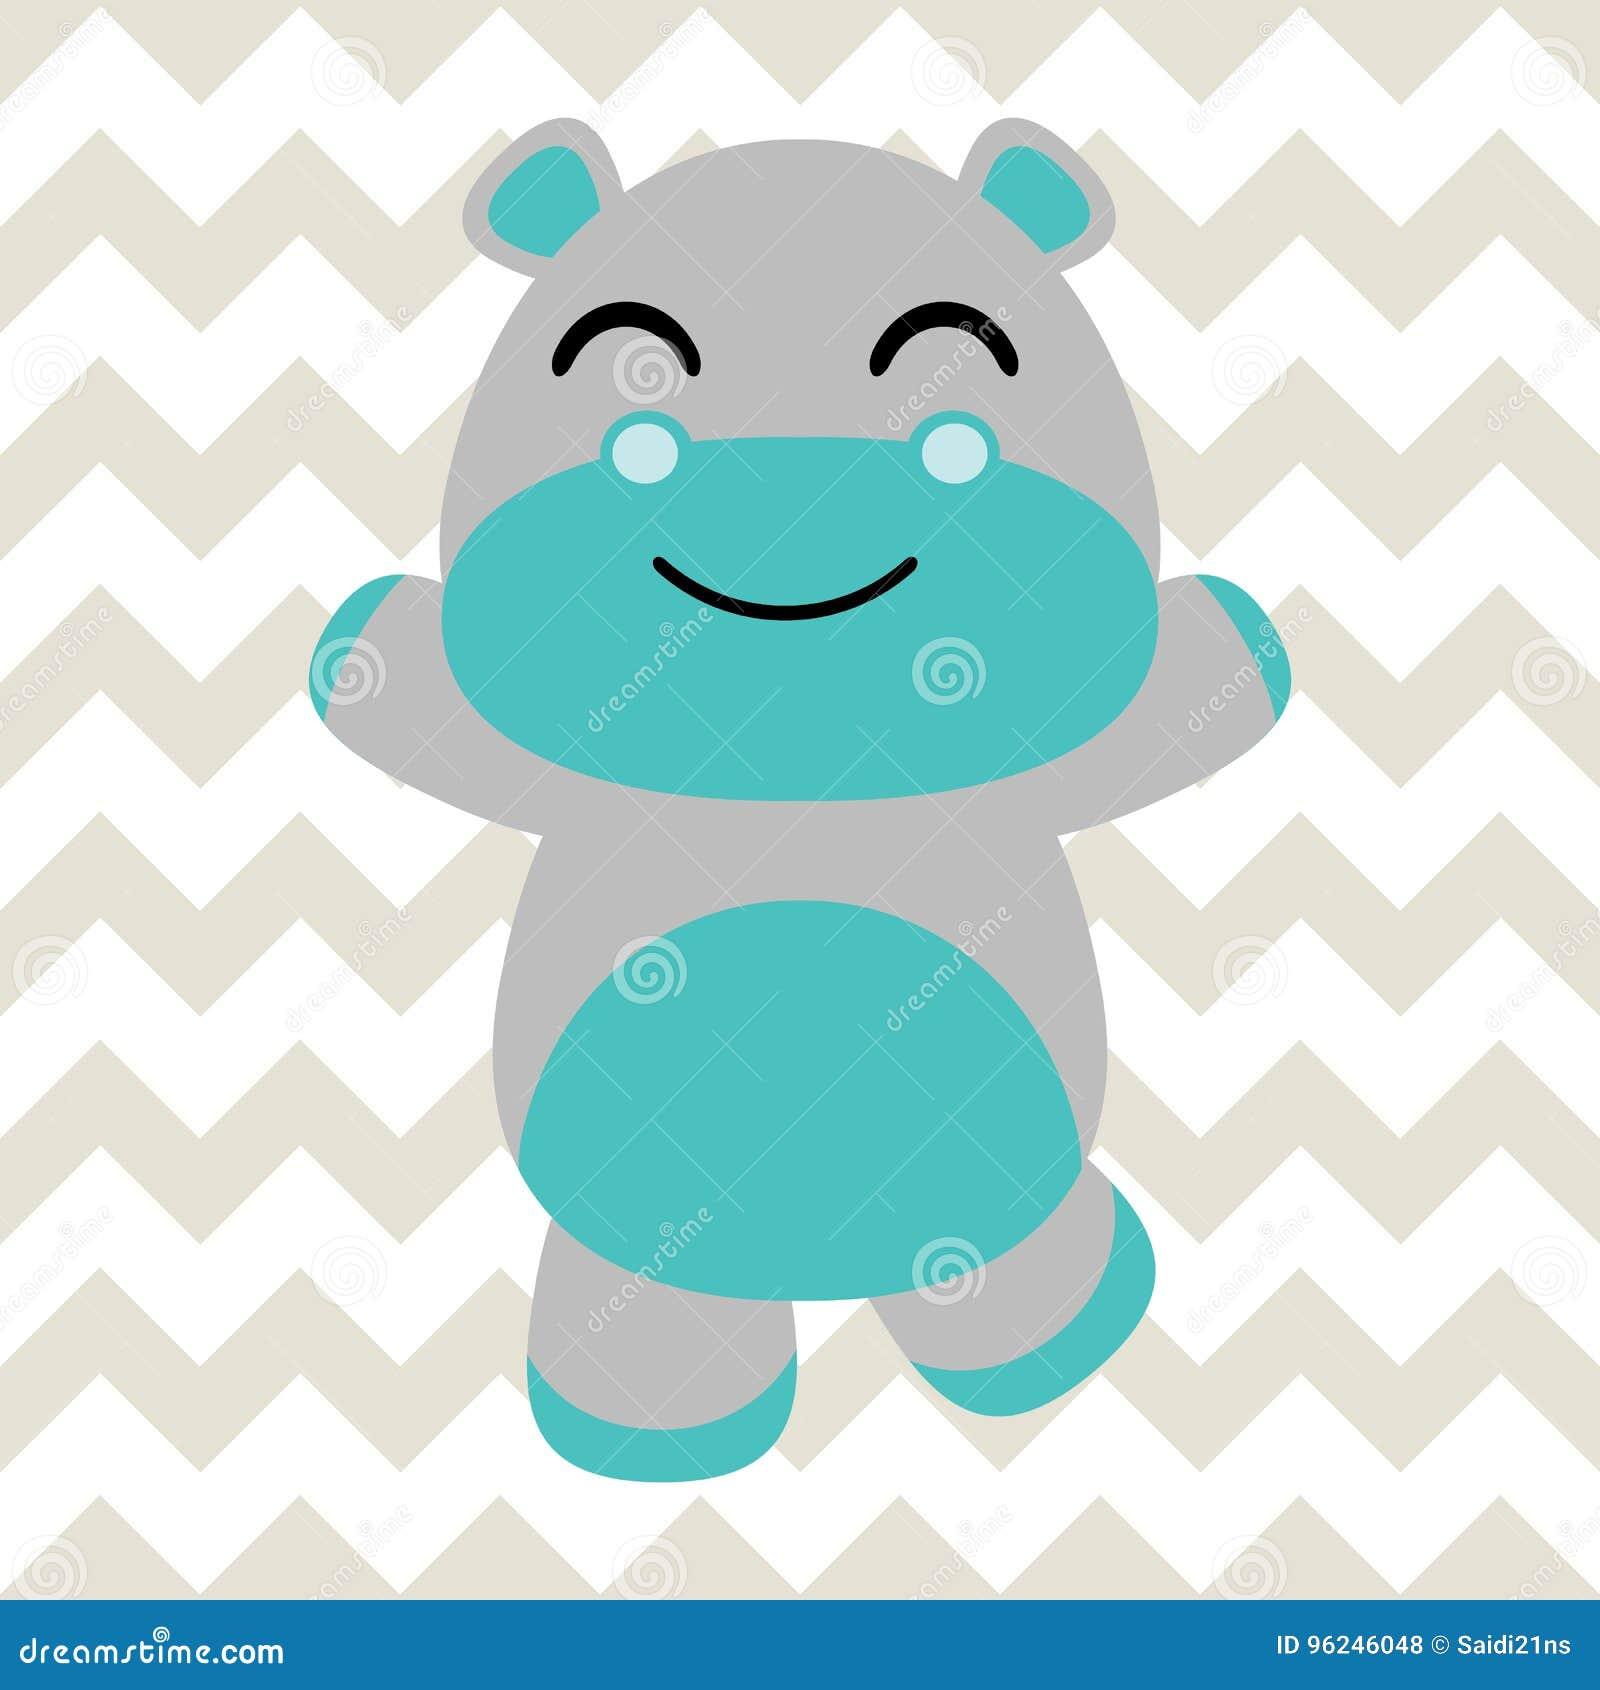 Baby Nursery Wall With Cartoon Of Cute Baby Hippo On Chevron